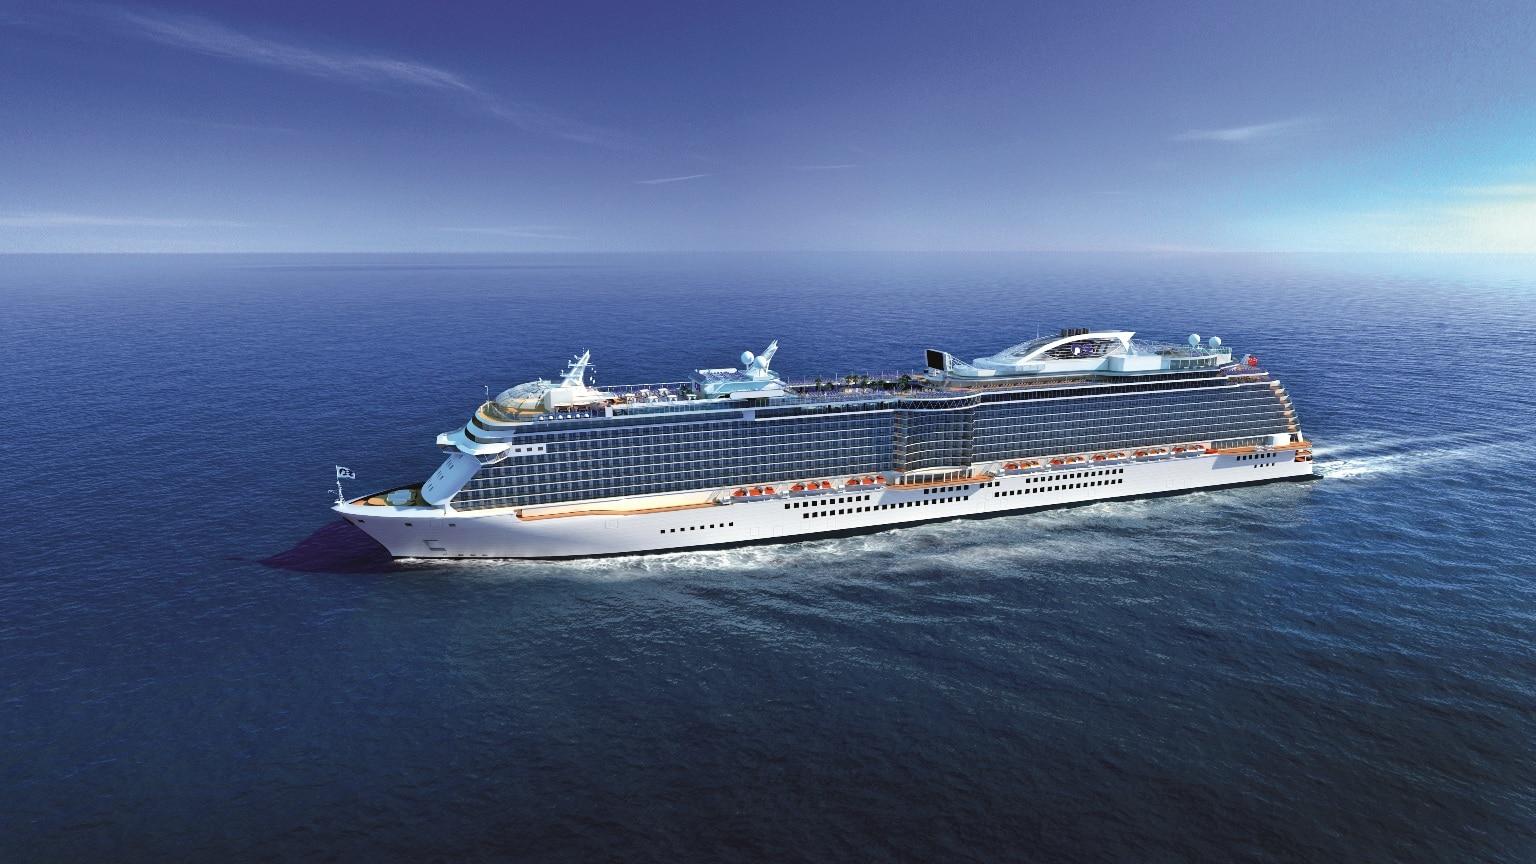 Princess Cruises Next New Ship To Be Based In China Year Round - Chinese cruise ship